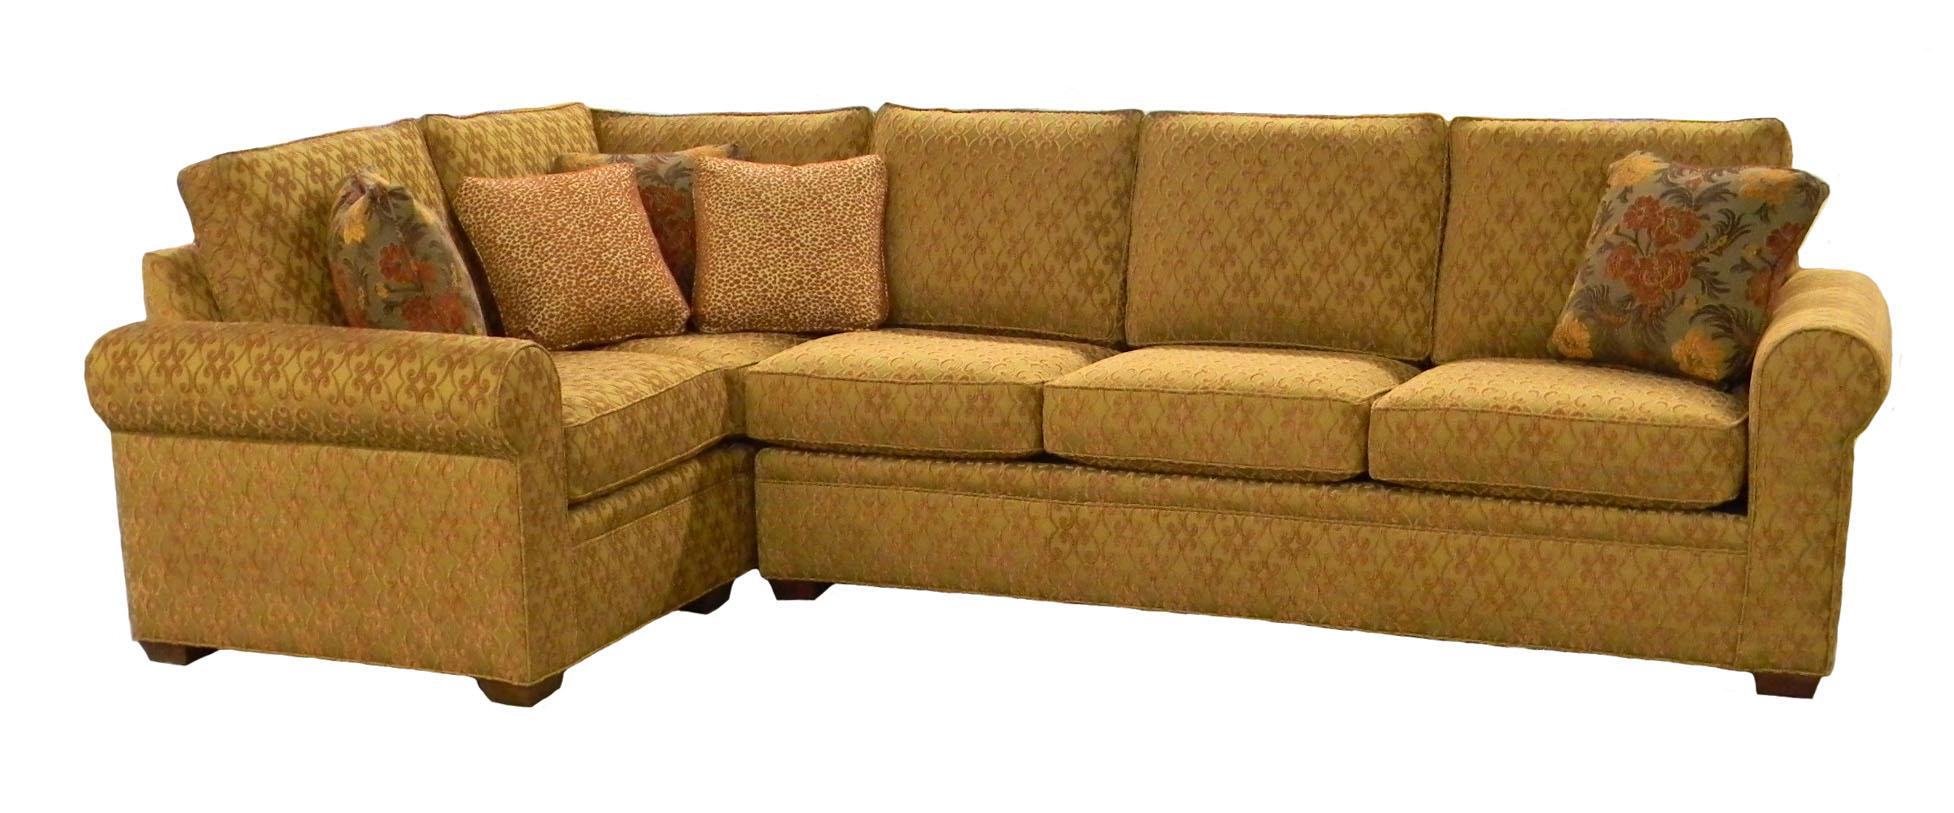 custom sectional sofa kensington bed review photos examples sofas carolina chair furniture byron reed